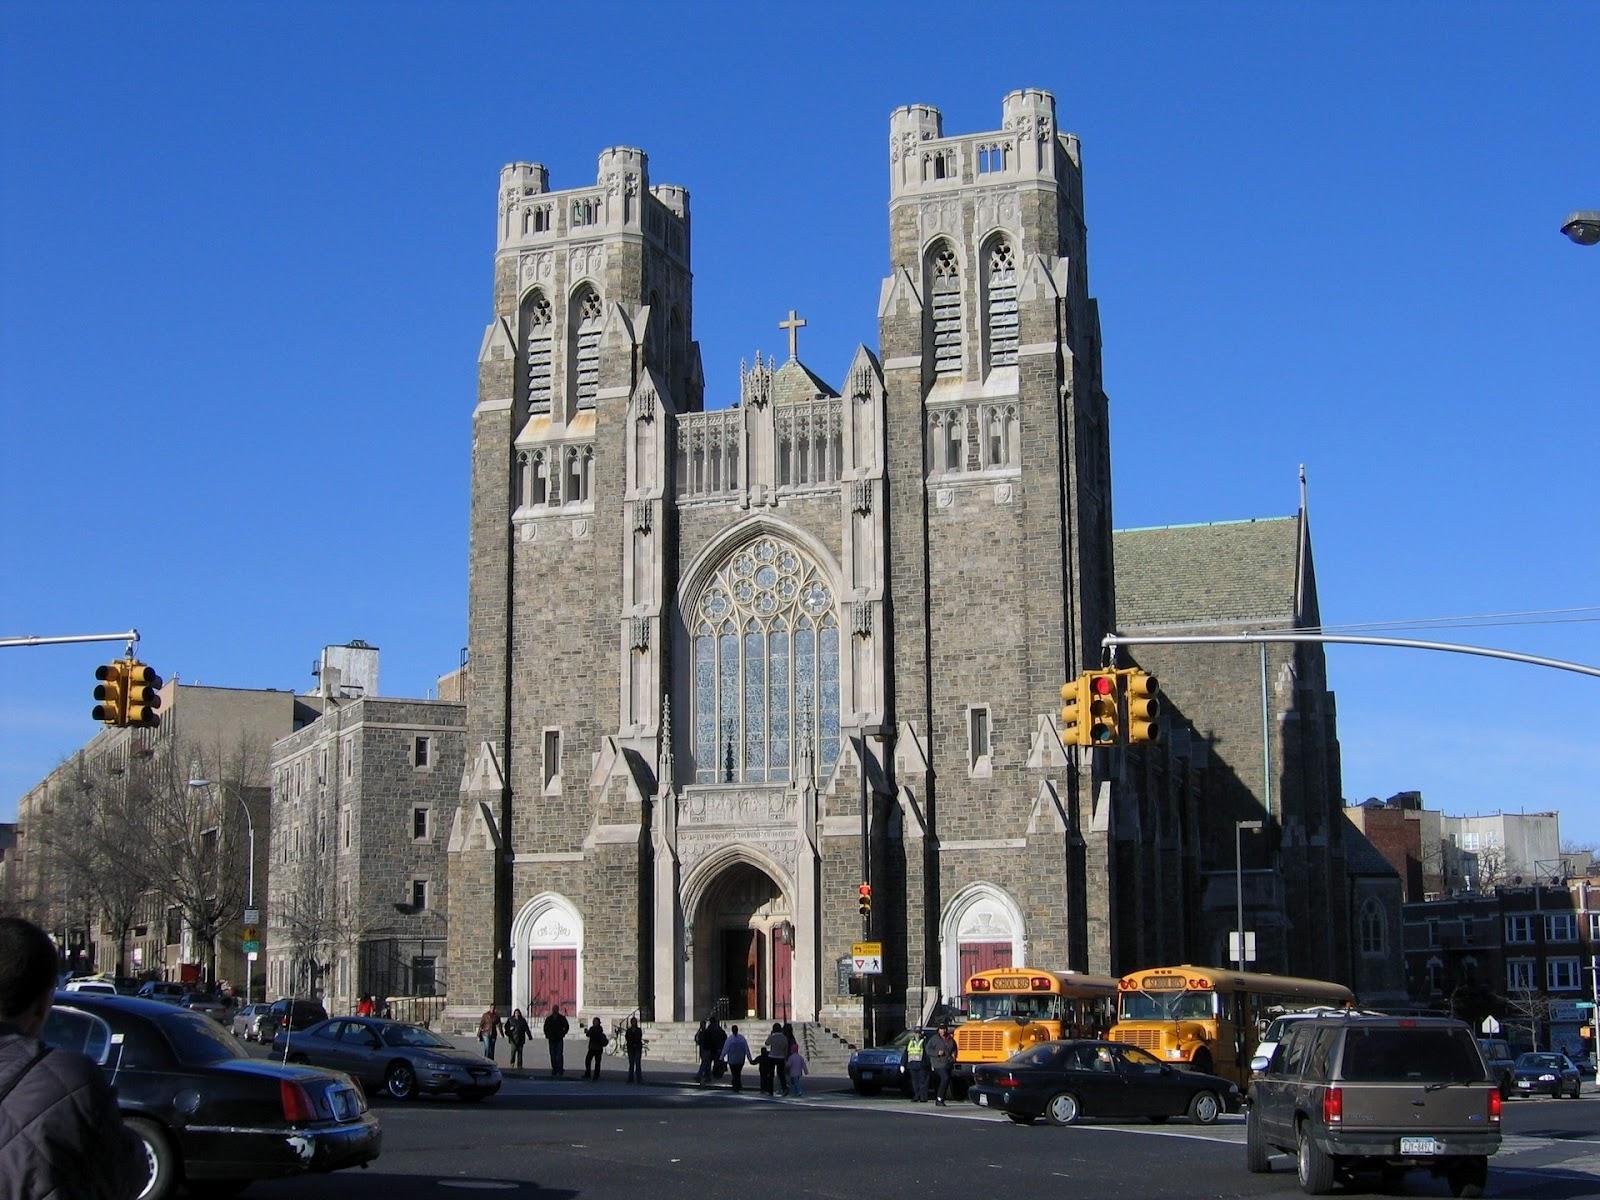 1306 St Nicholas Avenue New York: HD Wallpepars: New York City United States Wallpapers